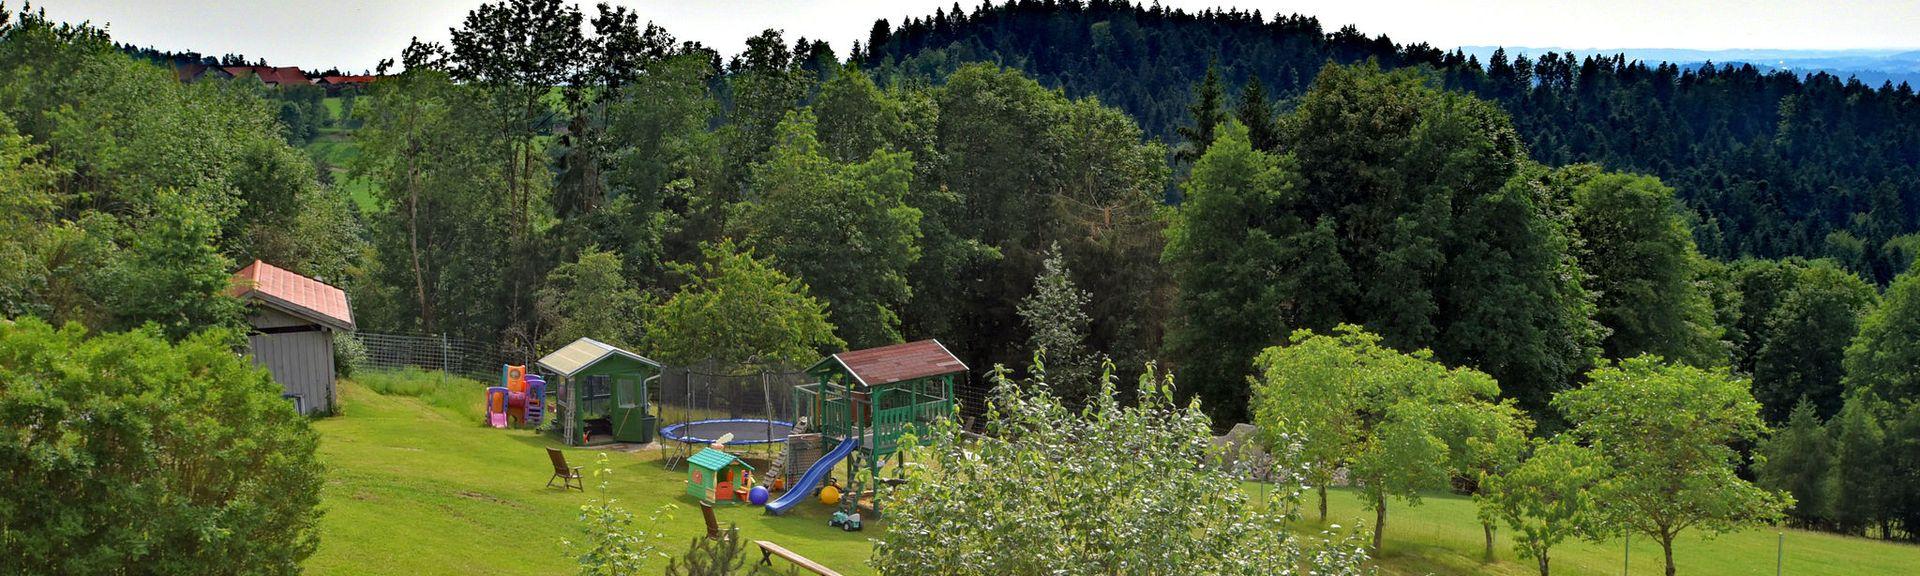 Bavarian Forest National Park, Neuschoenau, Germany